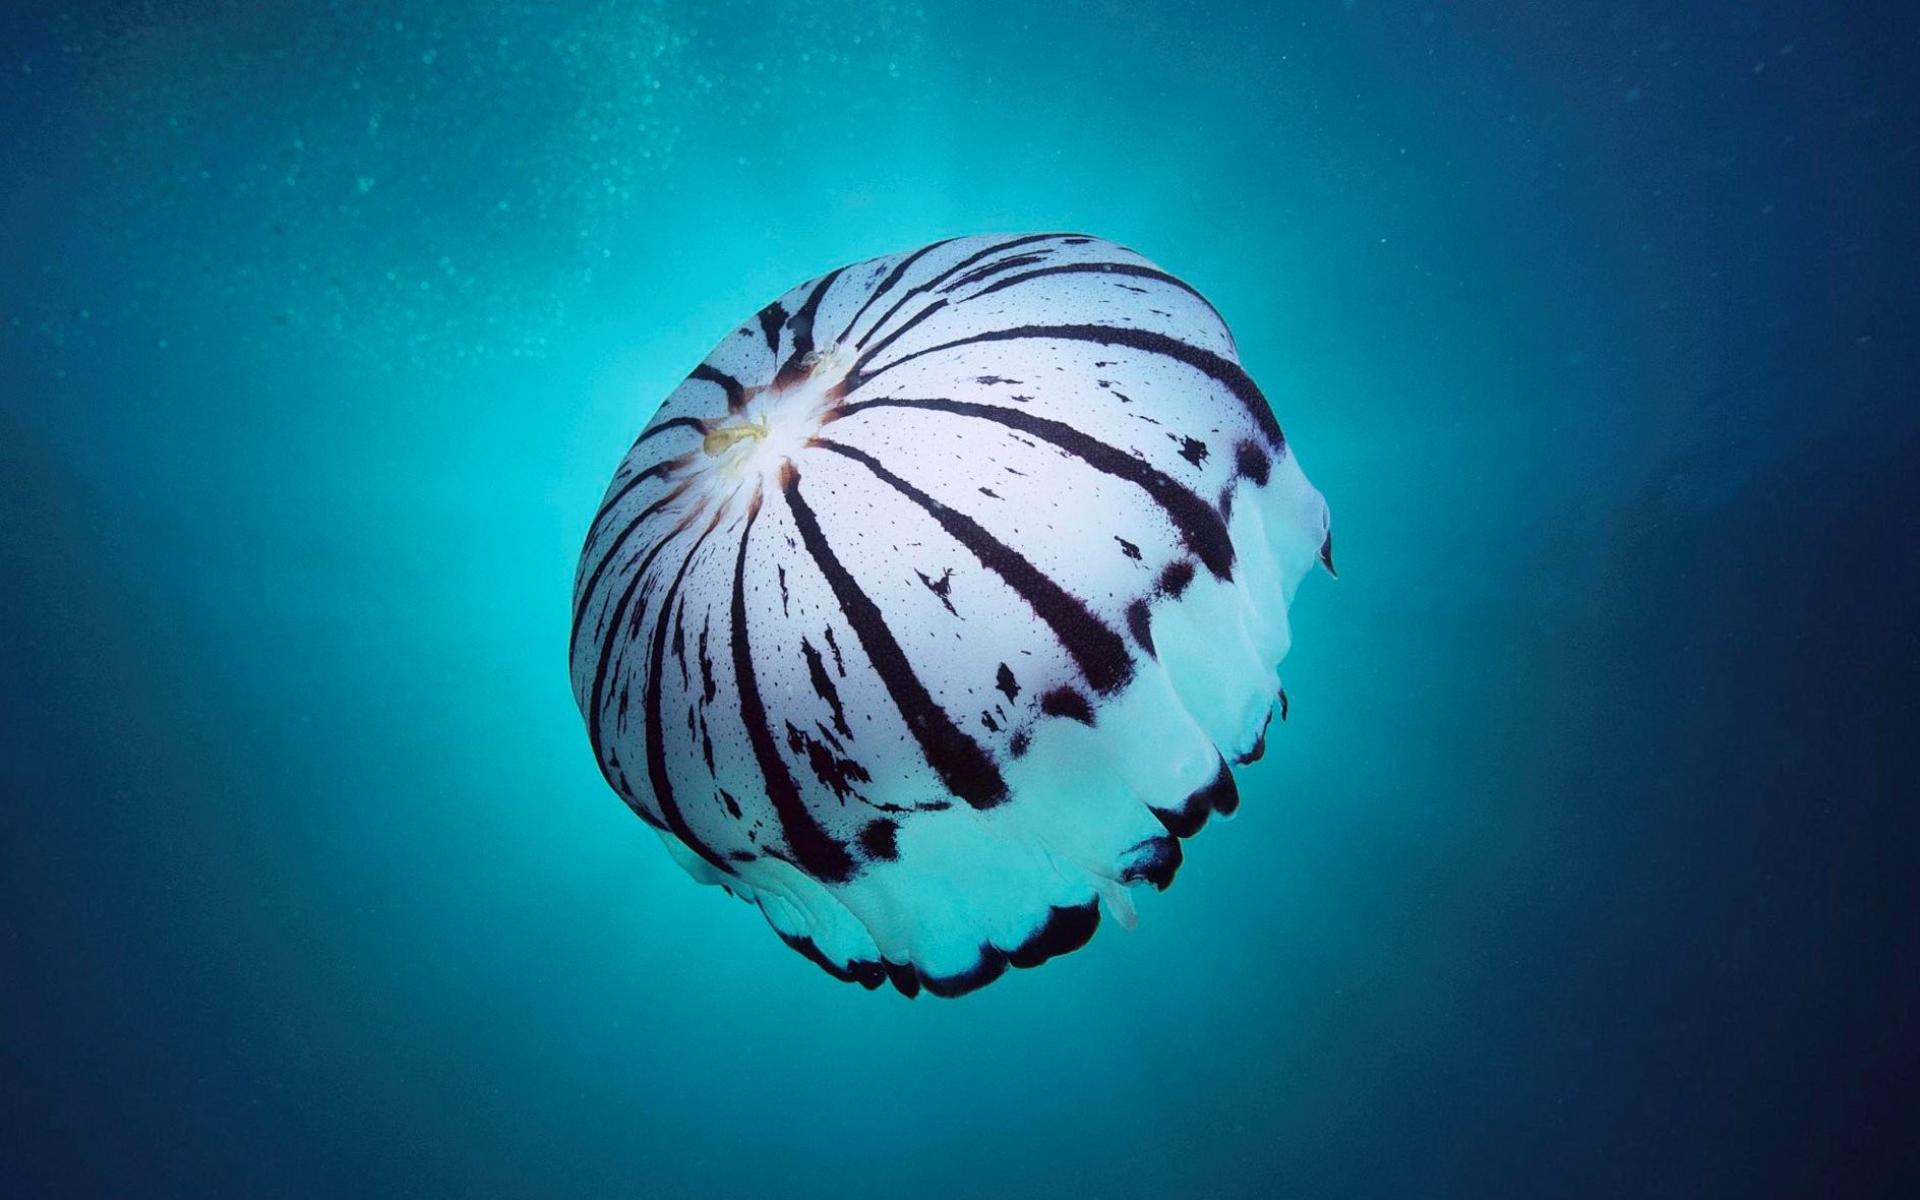 jellyfish wallpaper 4568